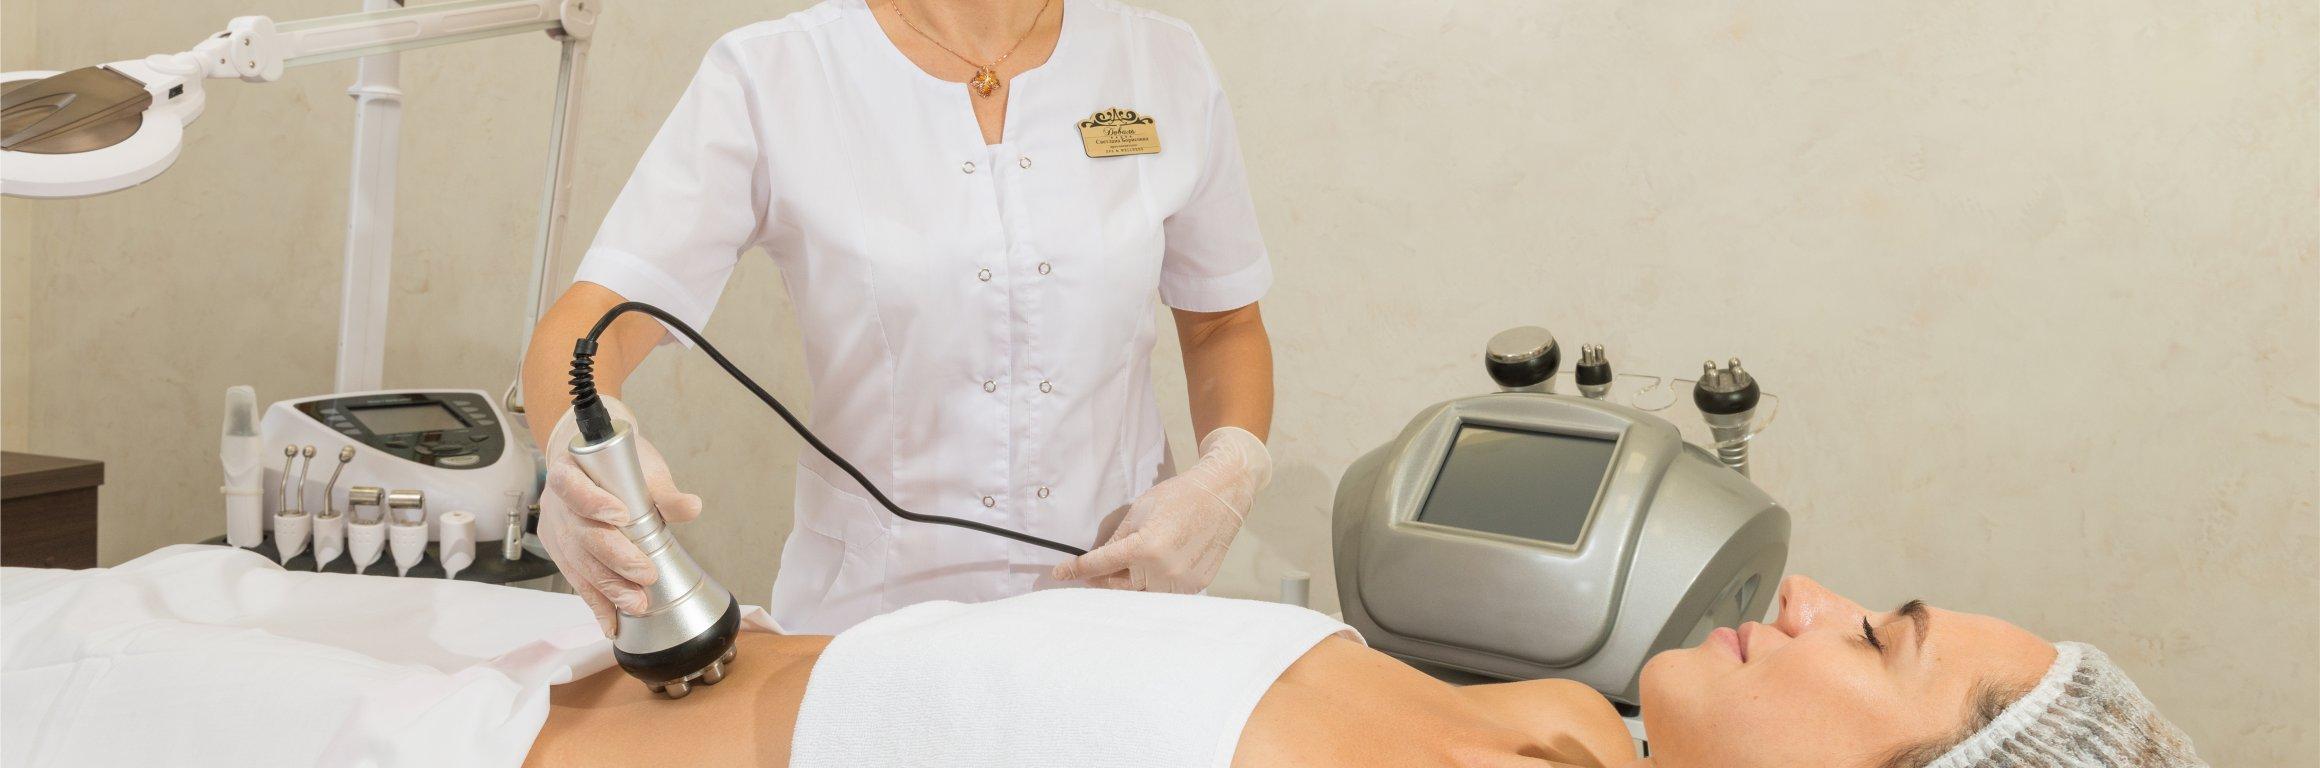 Фонофорез с гидрокортизоном при остеохондрозе